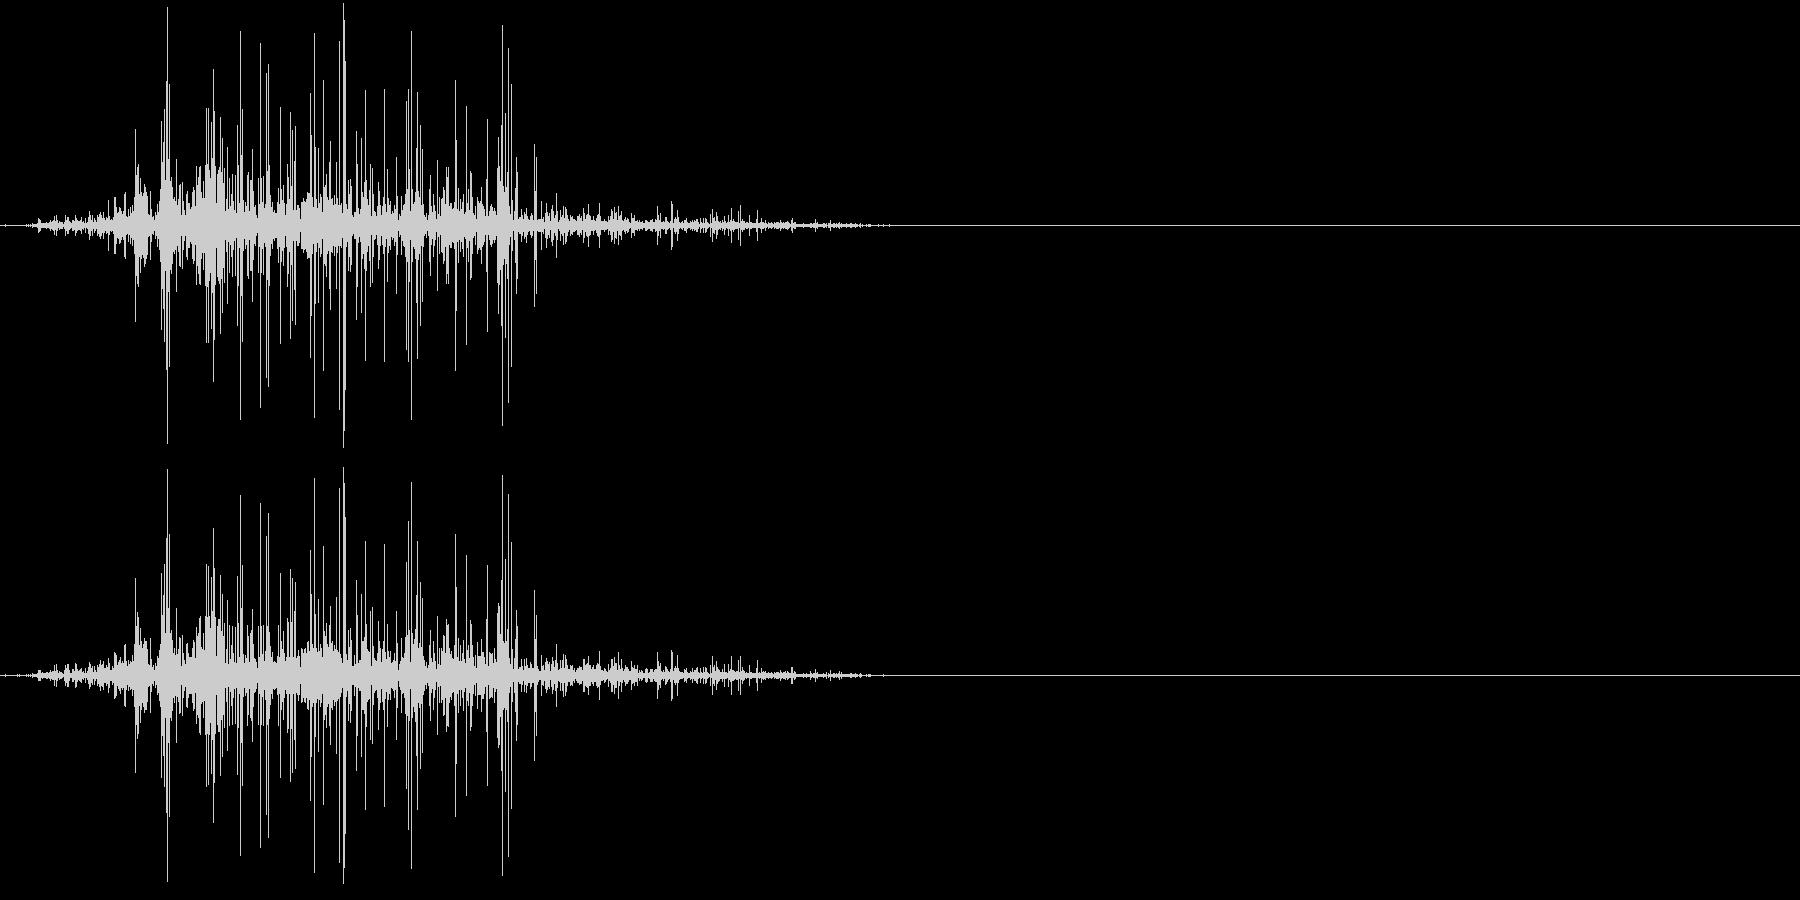 Zombie ゾンビの噛み付き音 1の未再生の波形